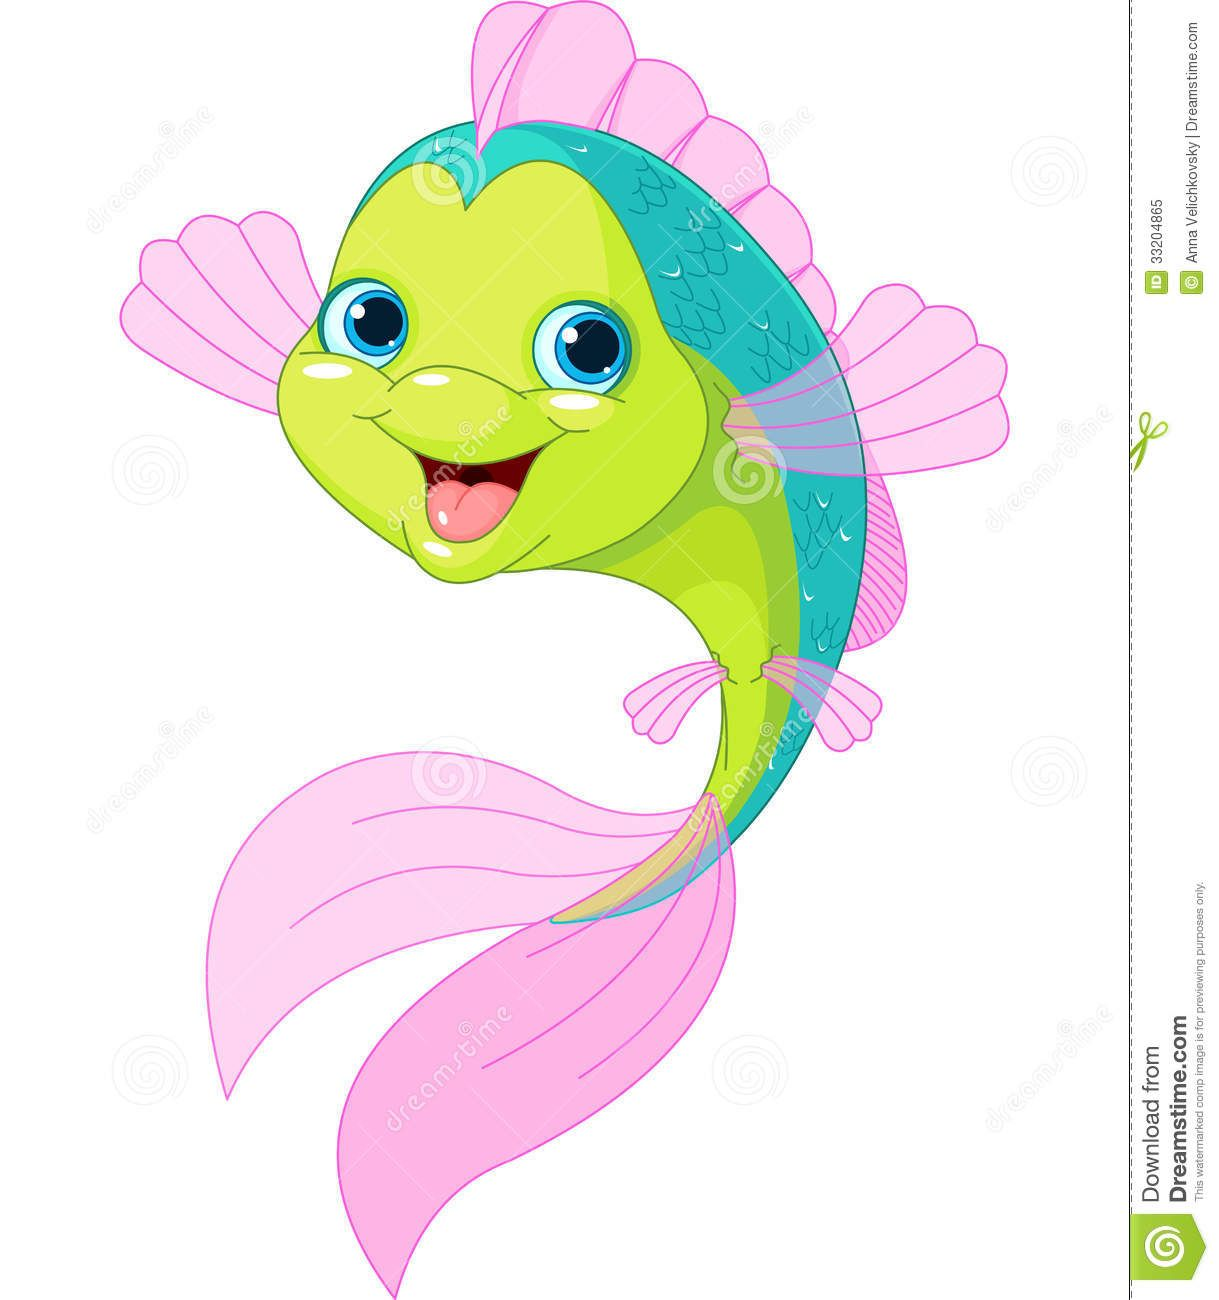 hight resolution of cute jellyfish clip art cute cartoon jellyfish clip art cute cartoon jellyfish image